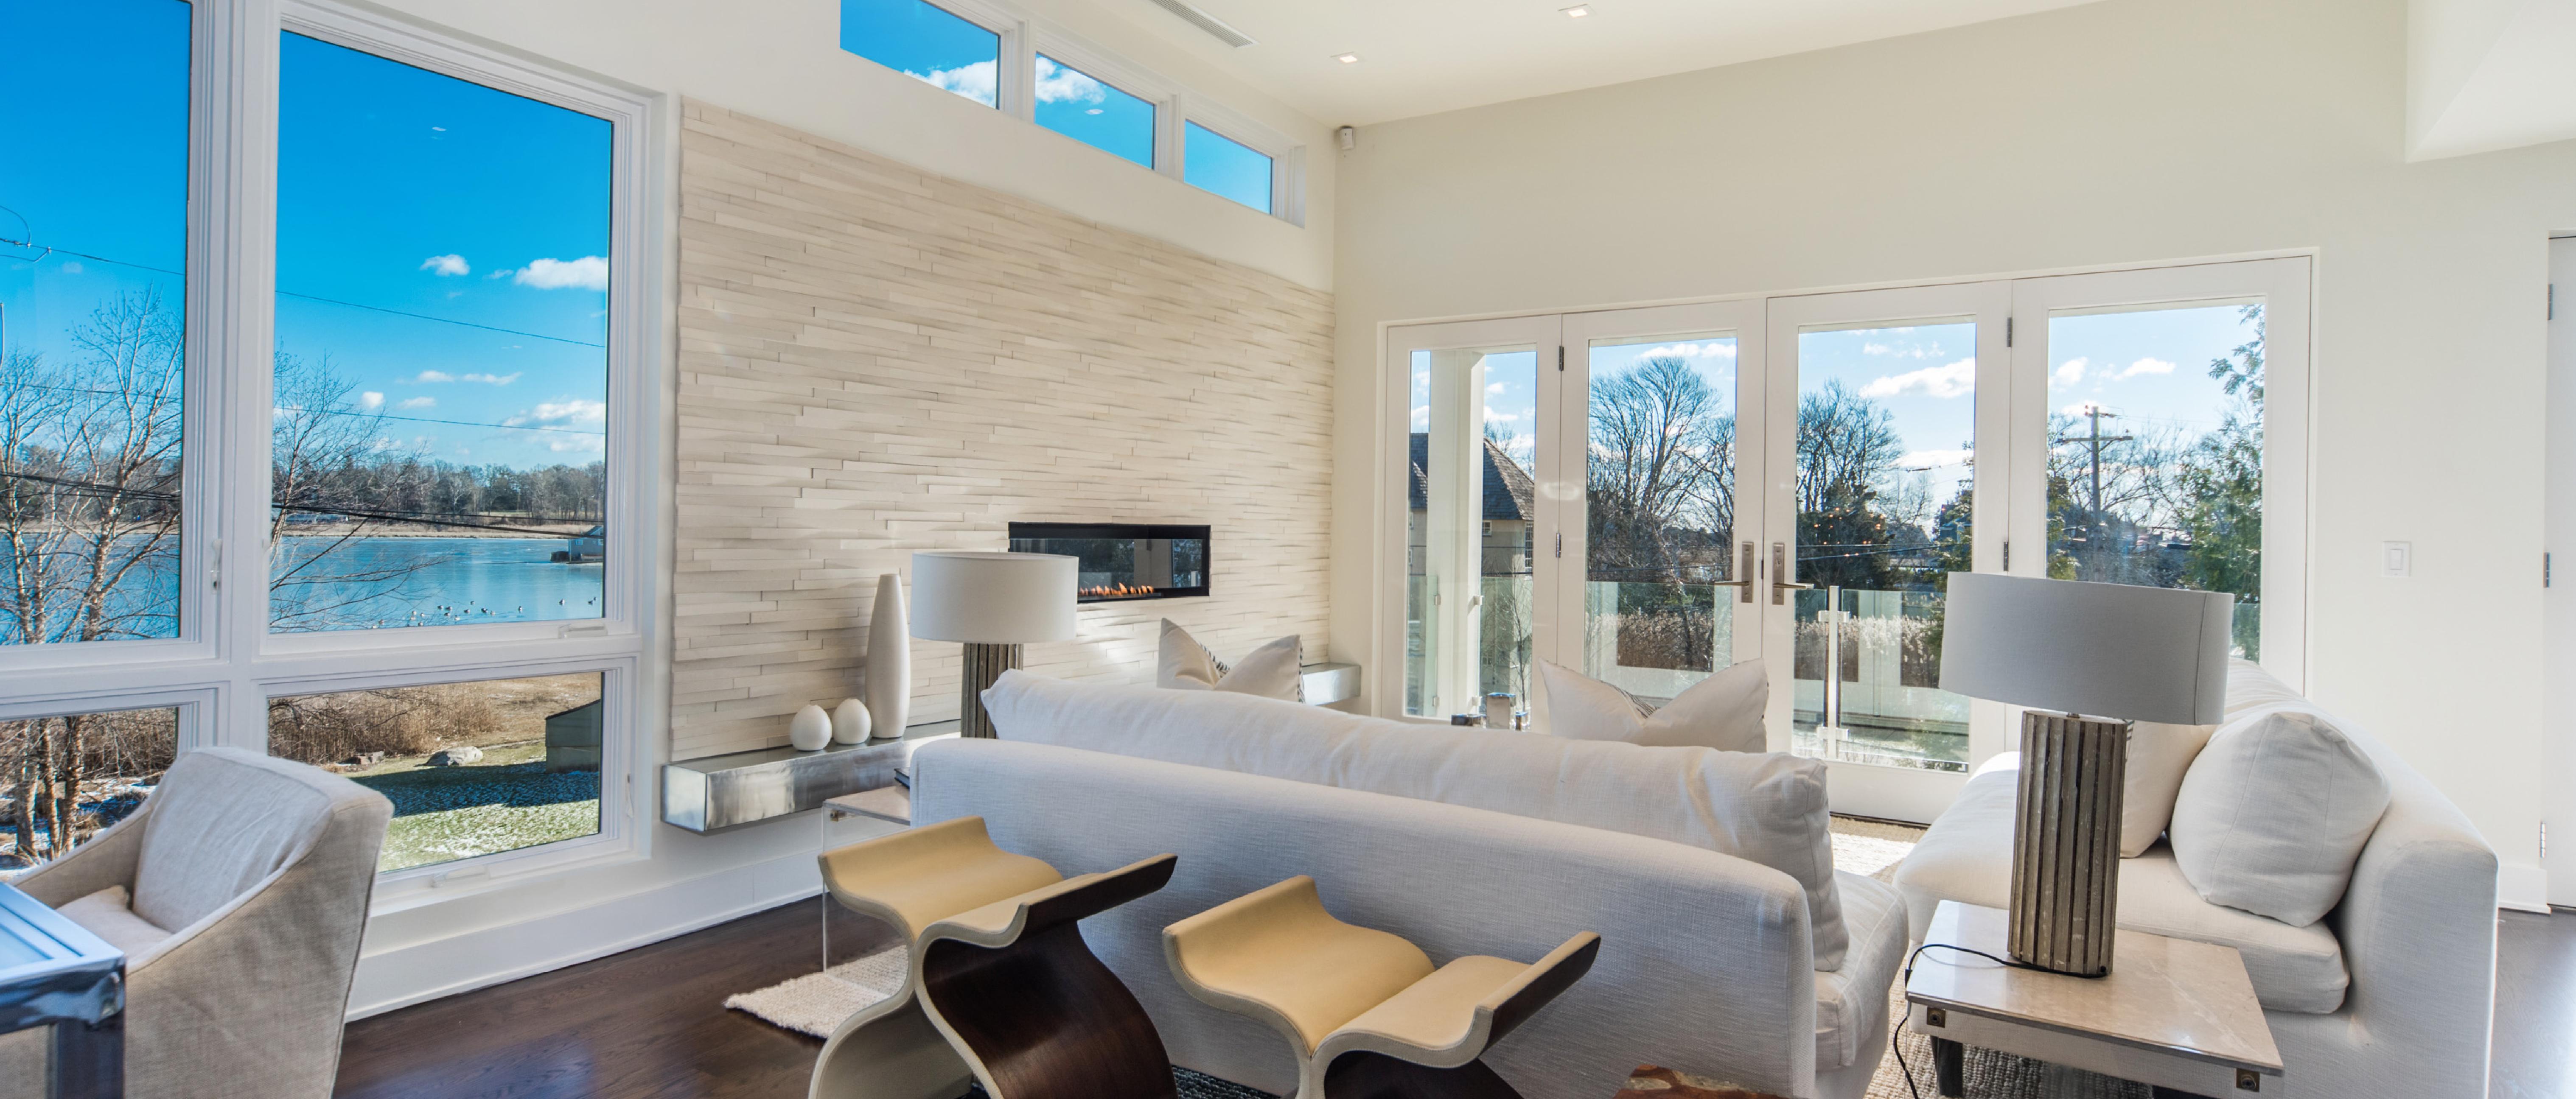 westchester cottage rachel house interior home design fairfield designers lake and newport county belden vt urban in